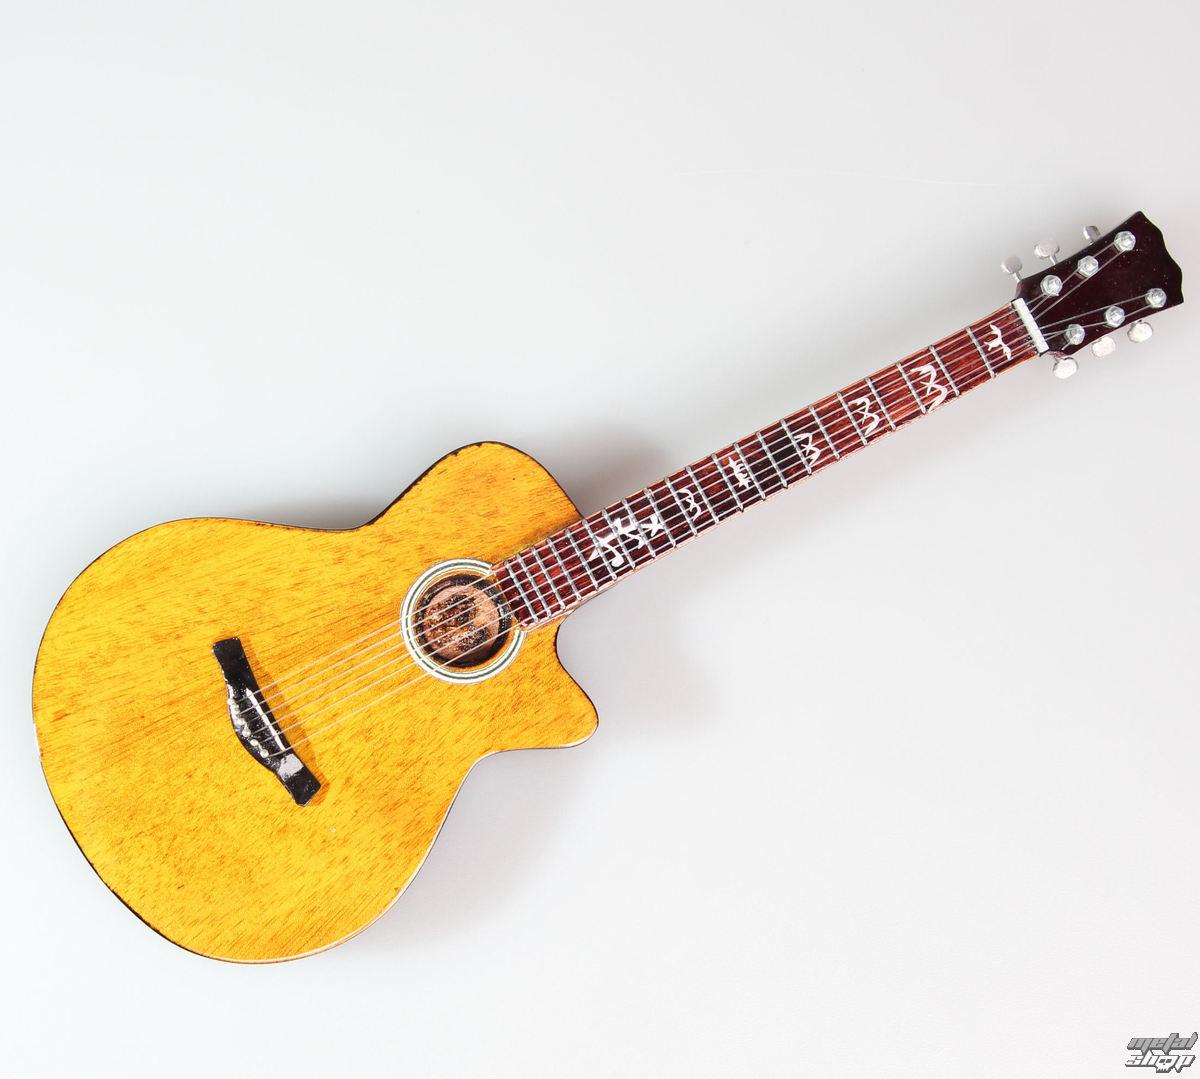 gitara Dave Matthew - DMB T Acoustic Signature - MINI GUITAR USA - Dave